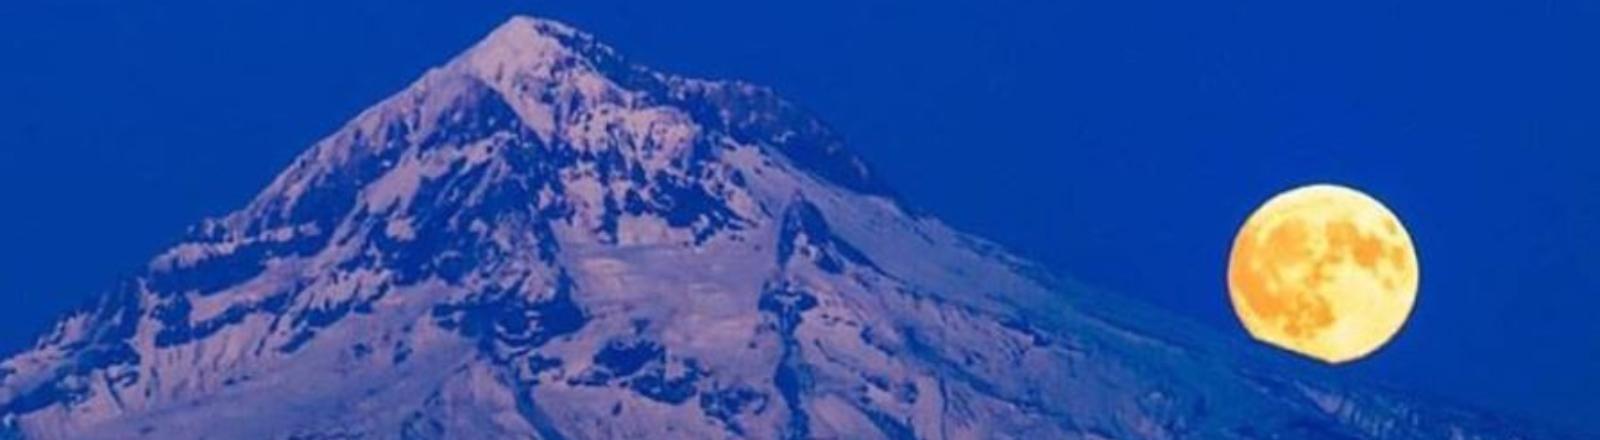 Harvest full moon glowing yellow and orange in a deep dark blue sky rises from behind Mt. Hood in Oregon's Mt. Hood Territory